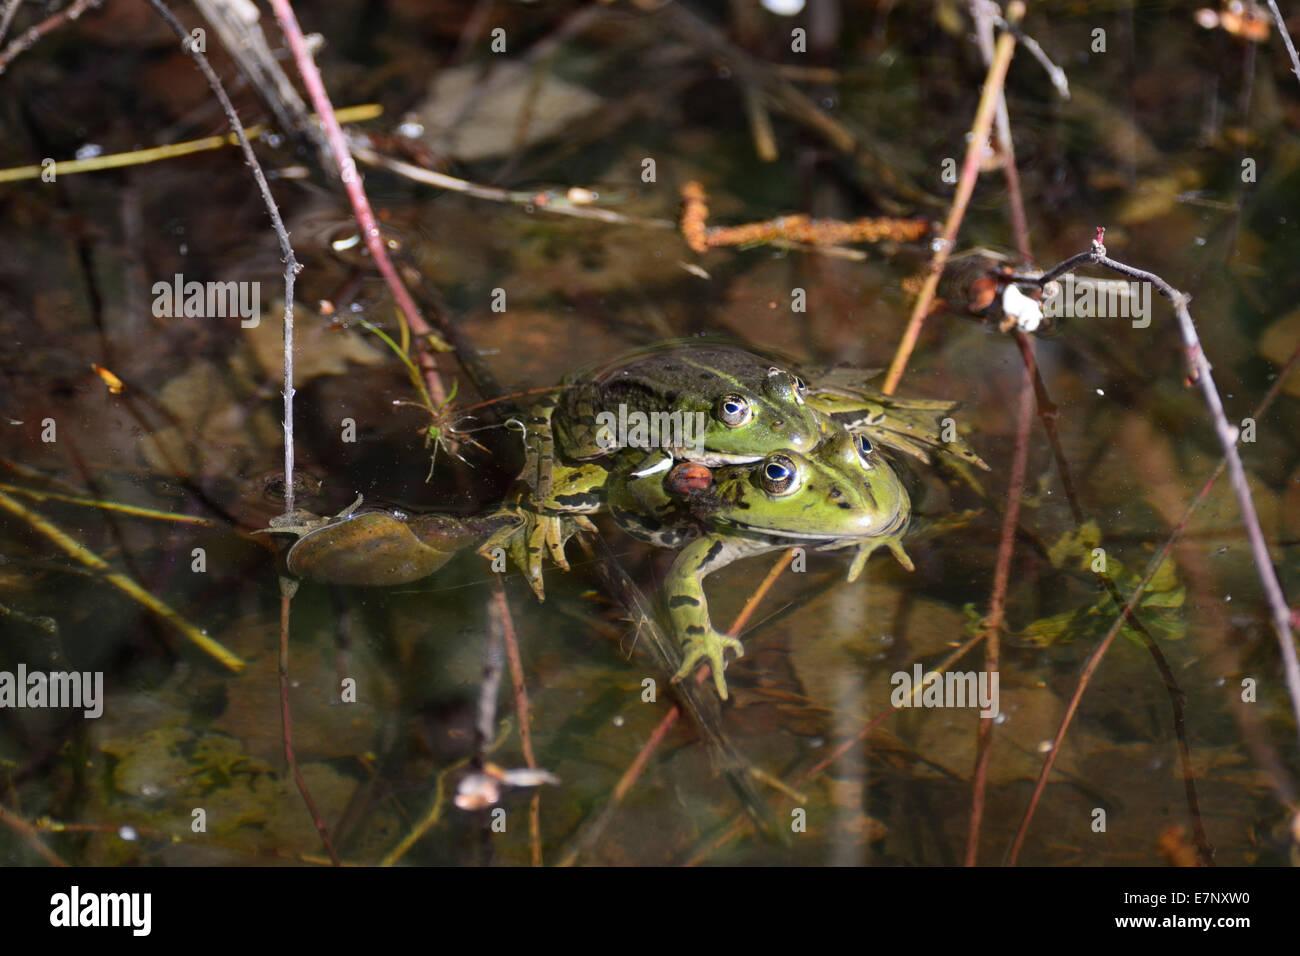 Edible frog, Rana esculenta, Ranidae, frog, amphibious animal, animal, mating, Champ-Pittet, Grande Cariçaie, - Stock Image